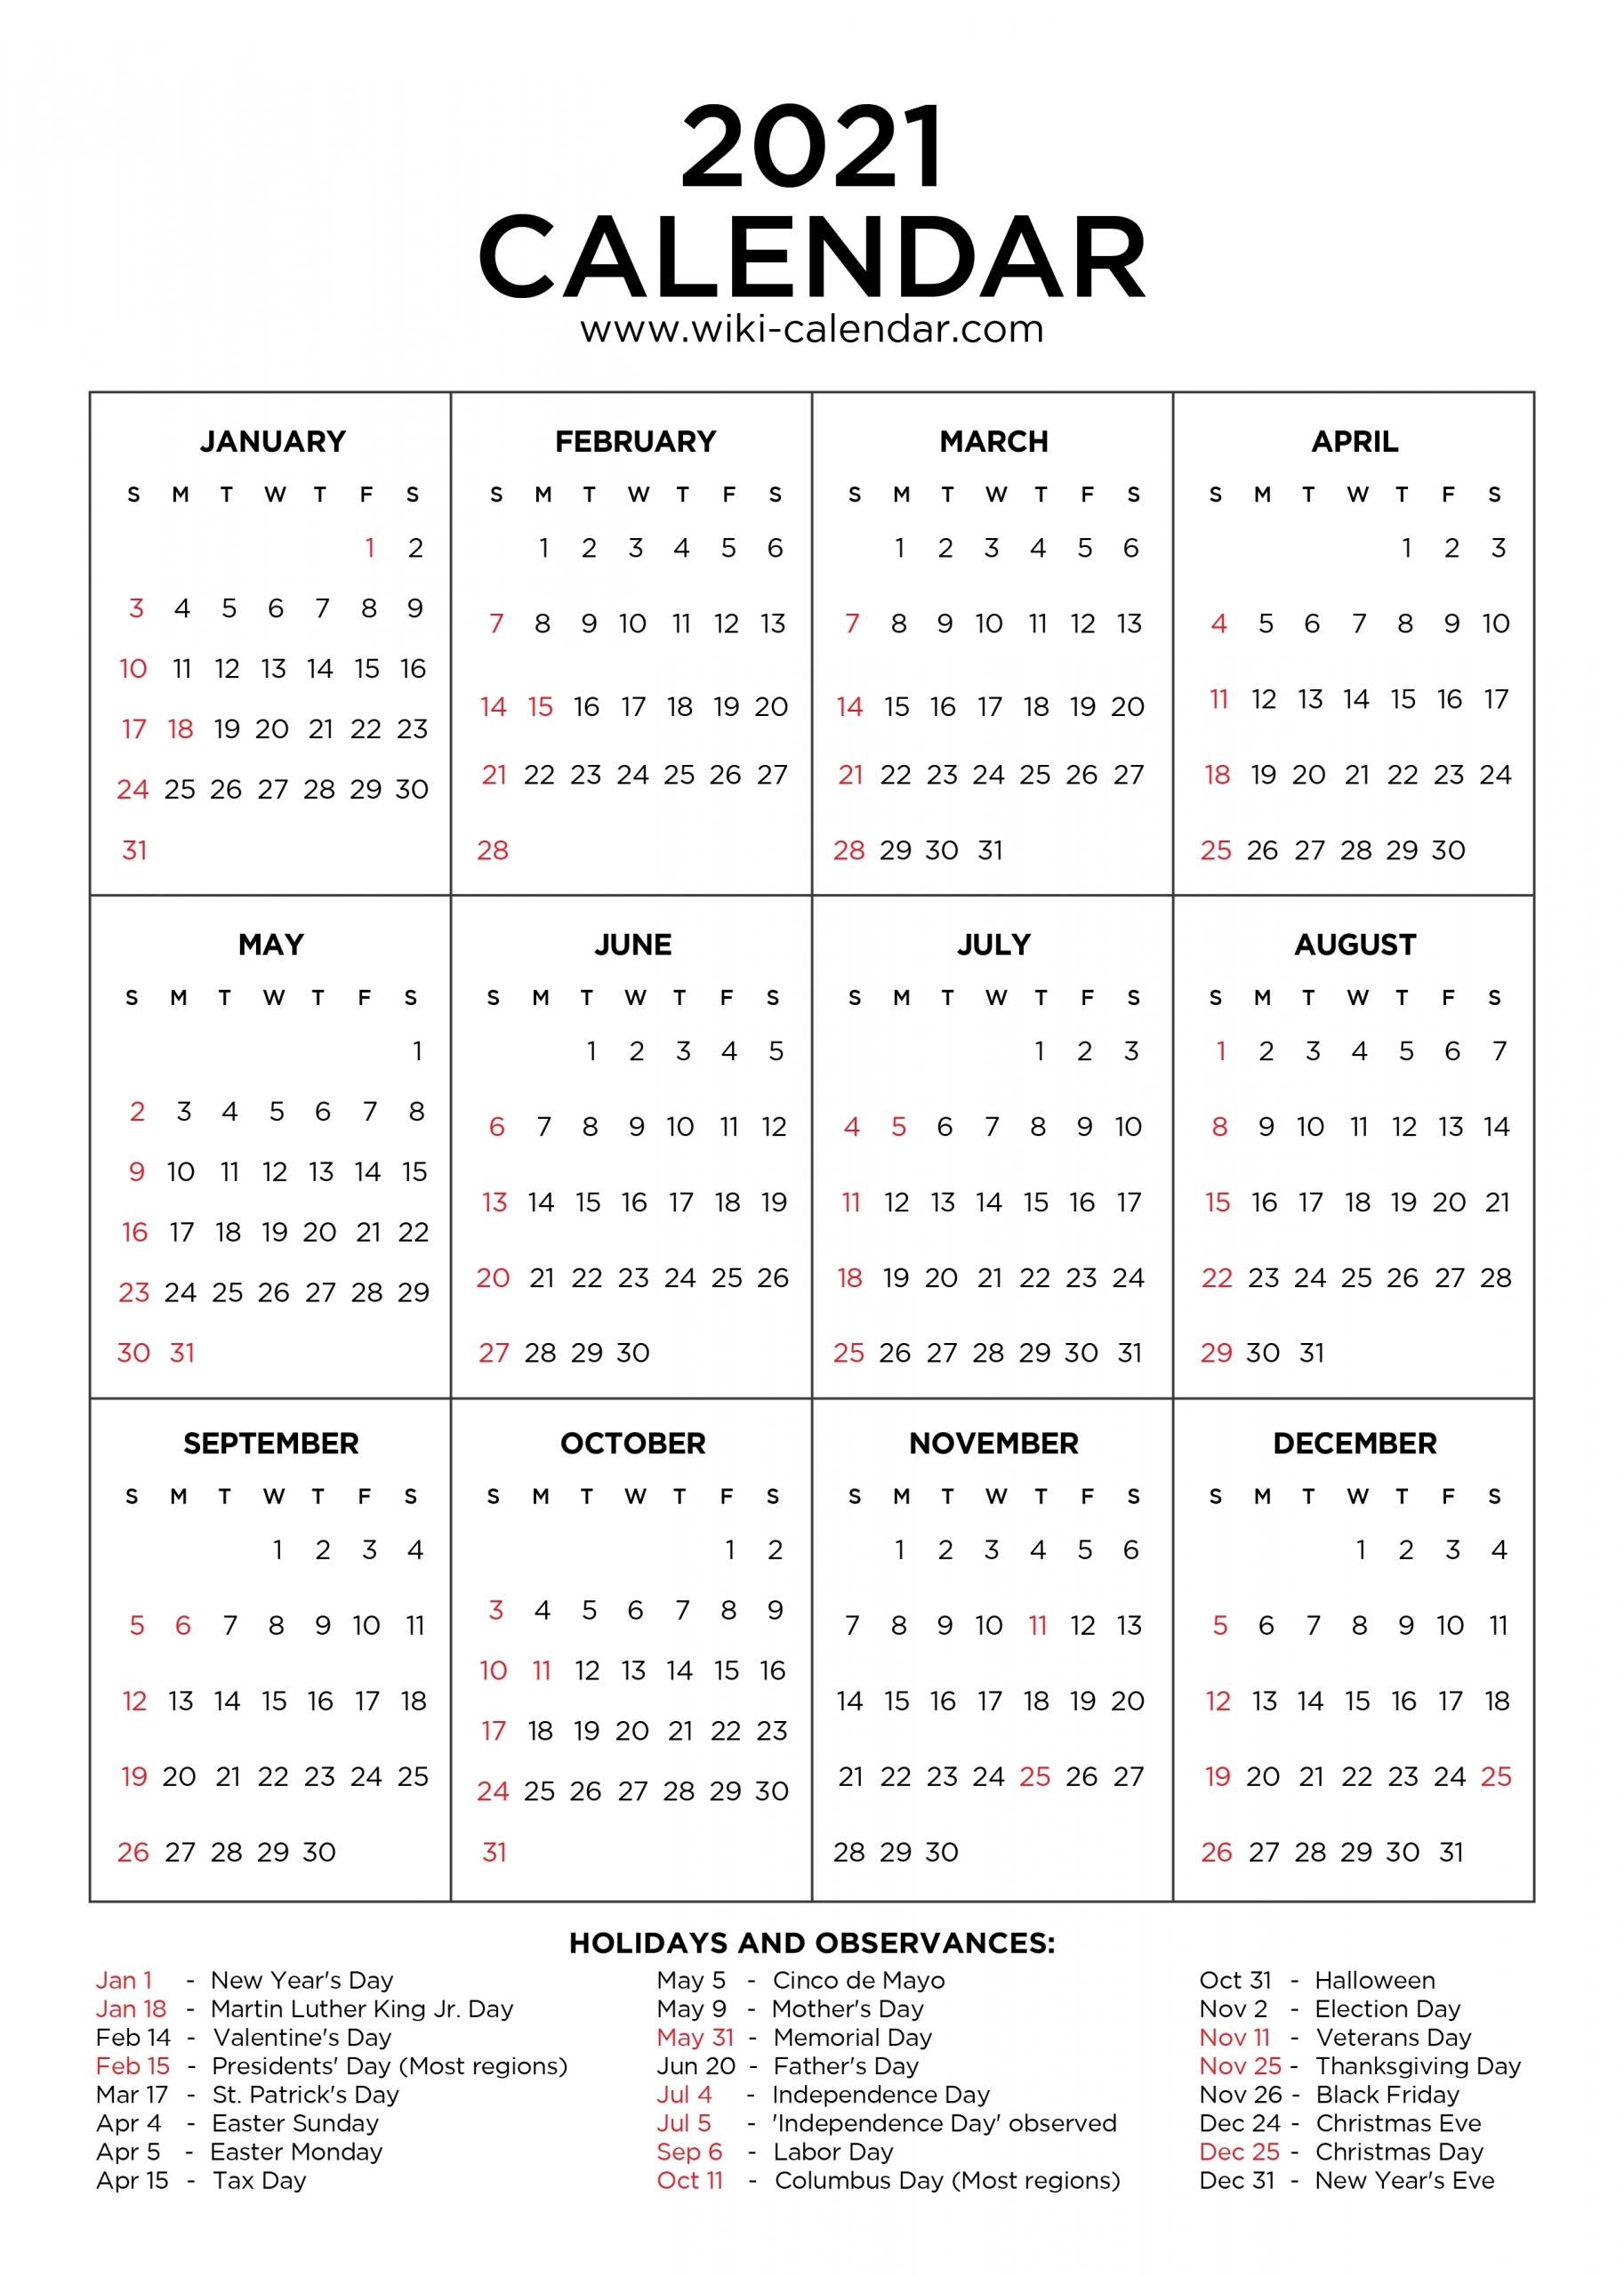 2021 Calendar With Holidays Printable | Calendar Template Printable in Free Calendar Template 2021 Printable With Lines